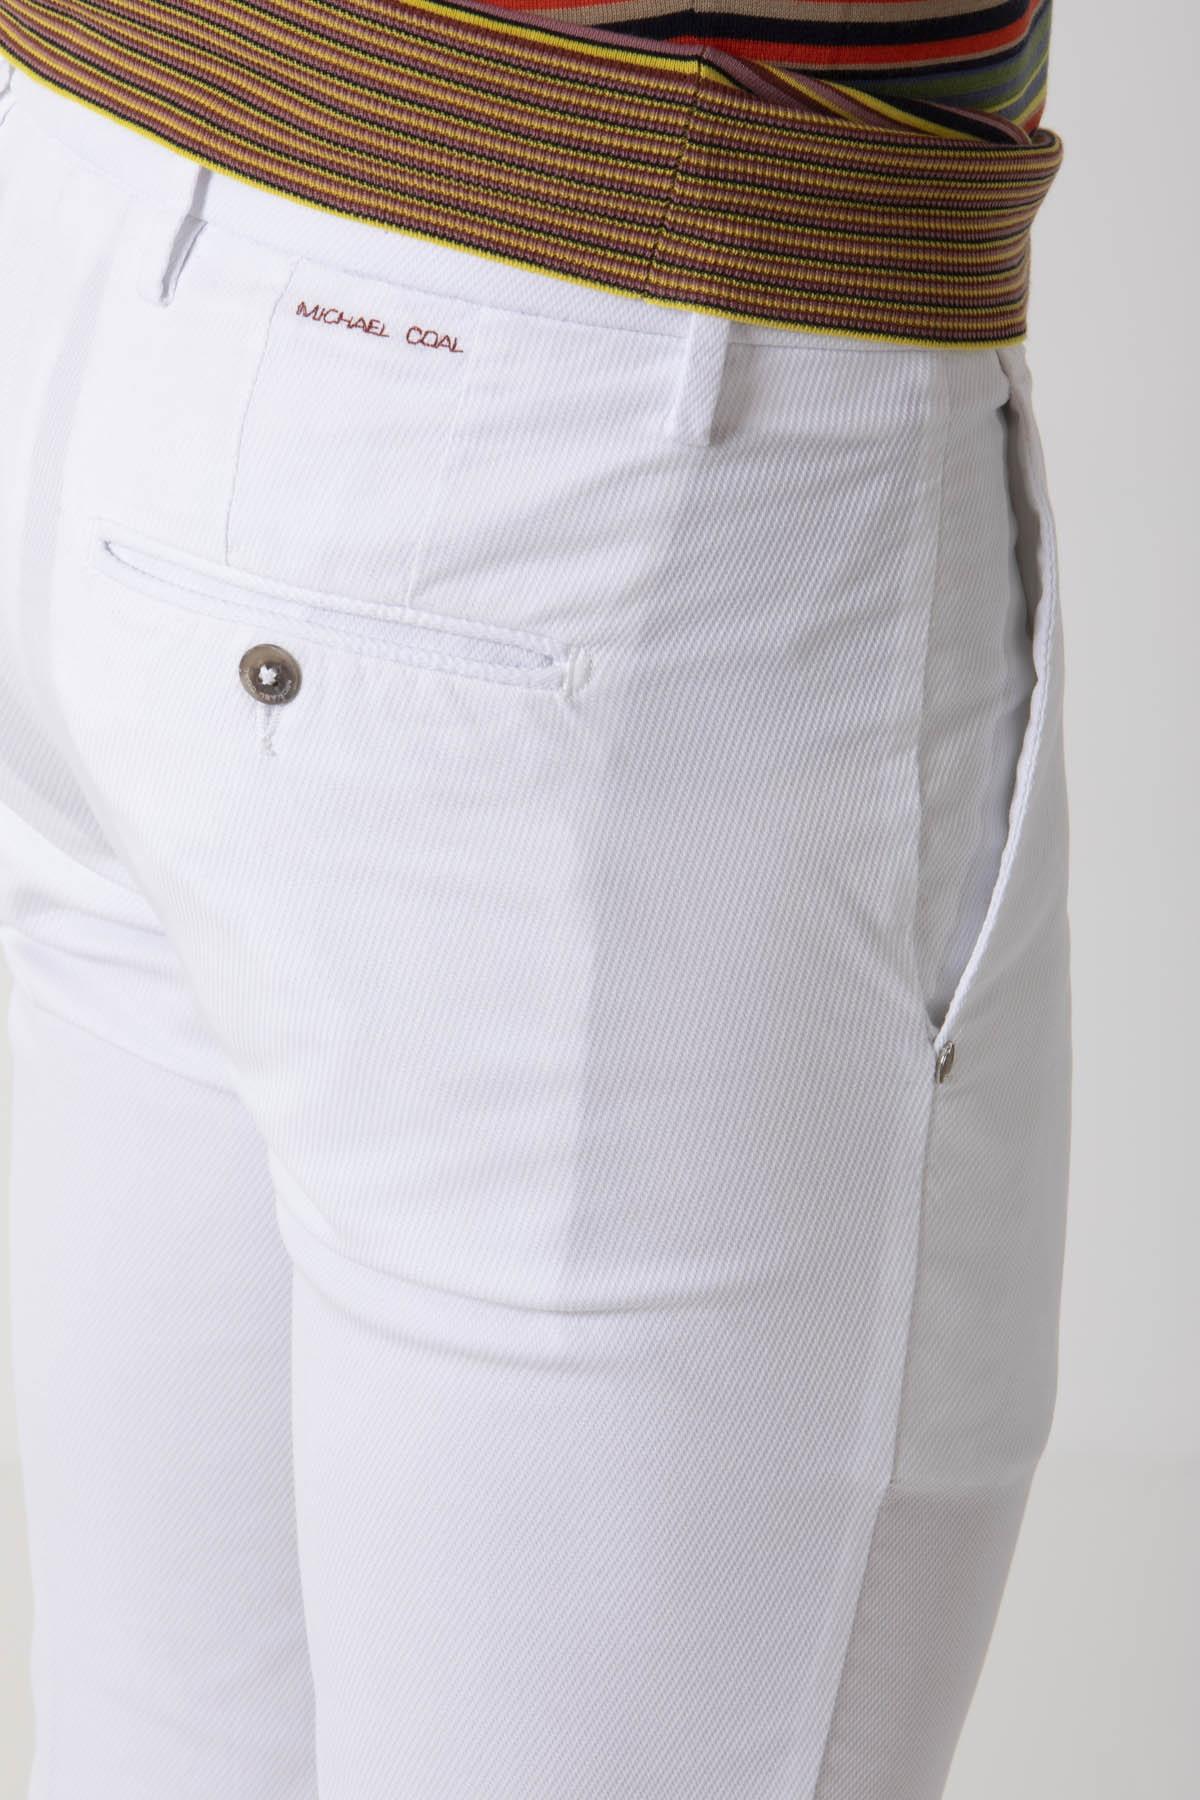 Pantaloni RICKY per uomo MICHAEL COAL P/E 19